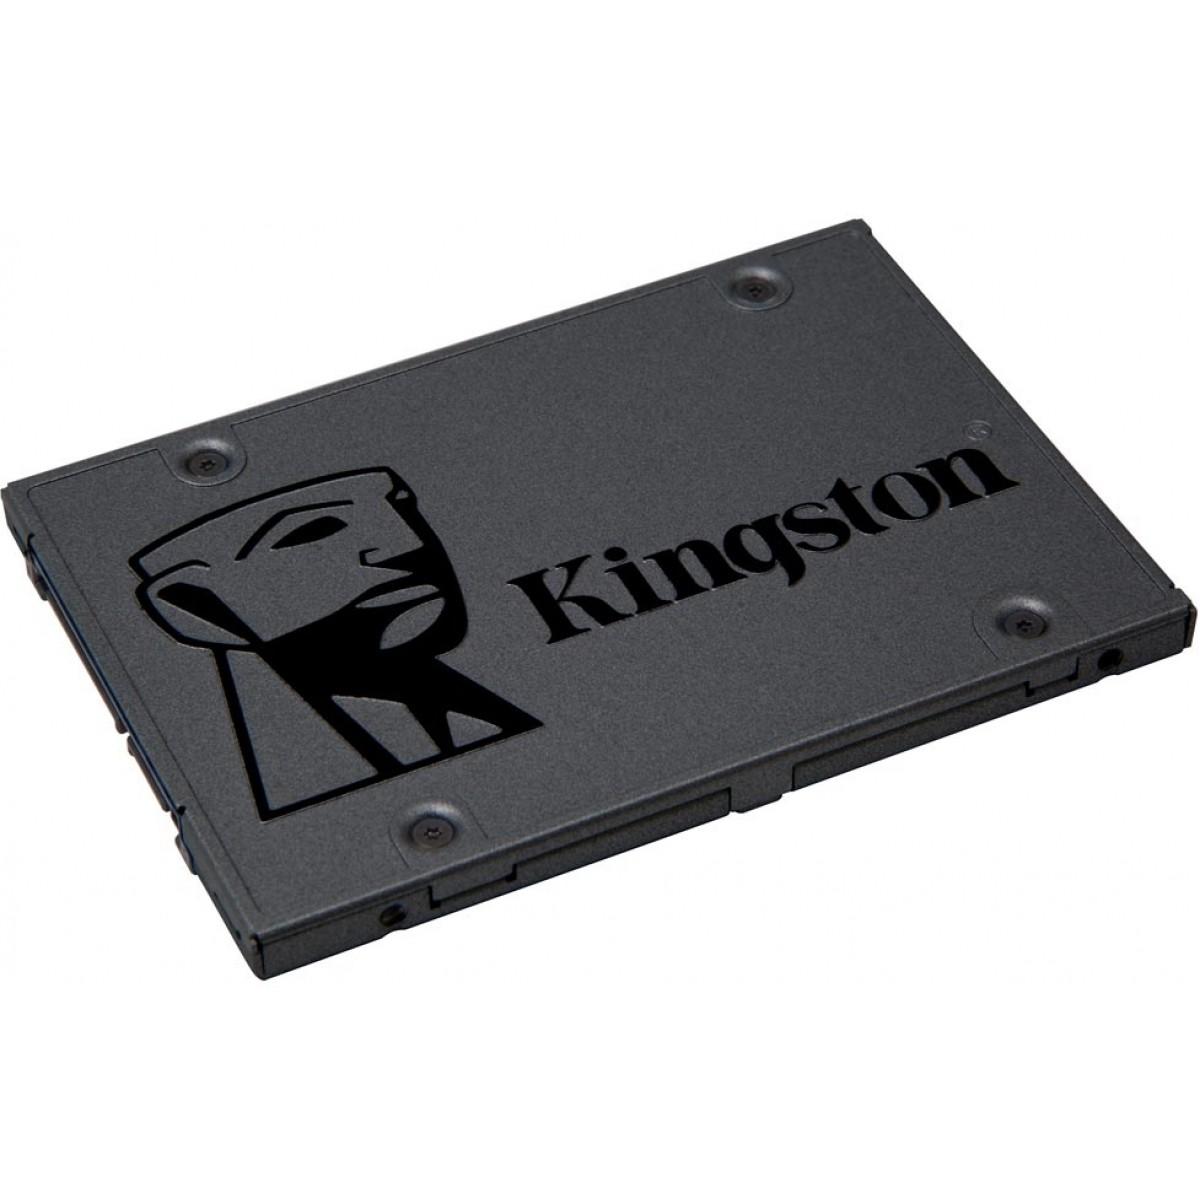 SSD Kingston A400, 240GB, Sata III, Leitura 500MBs Gravação 350MBs, SA400S37/240G